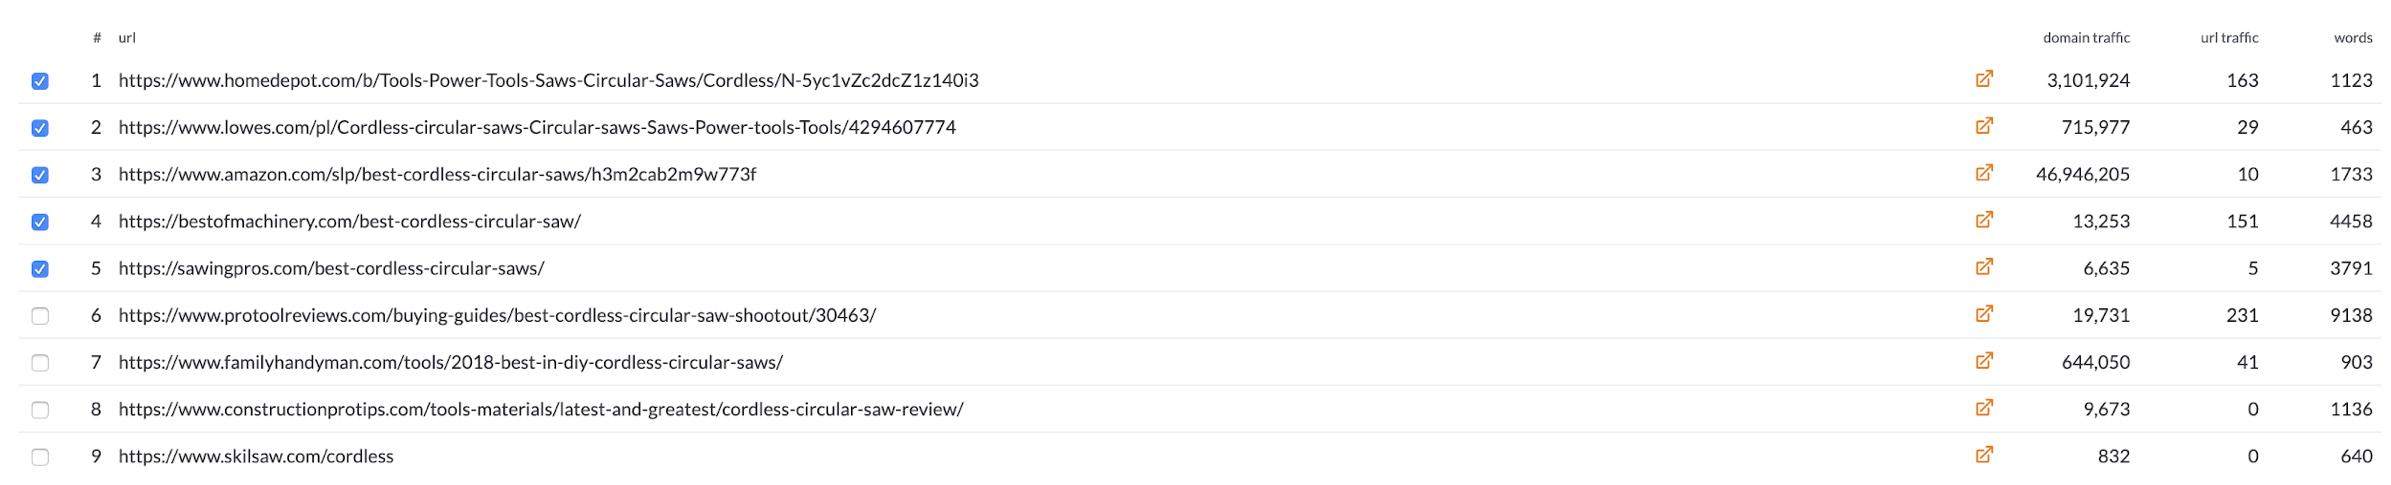 url page comparison tab